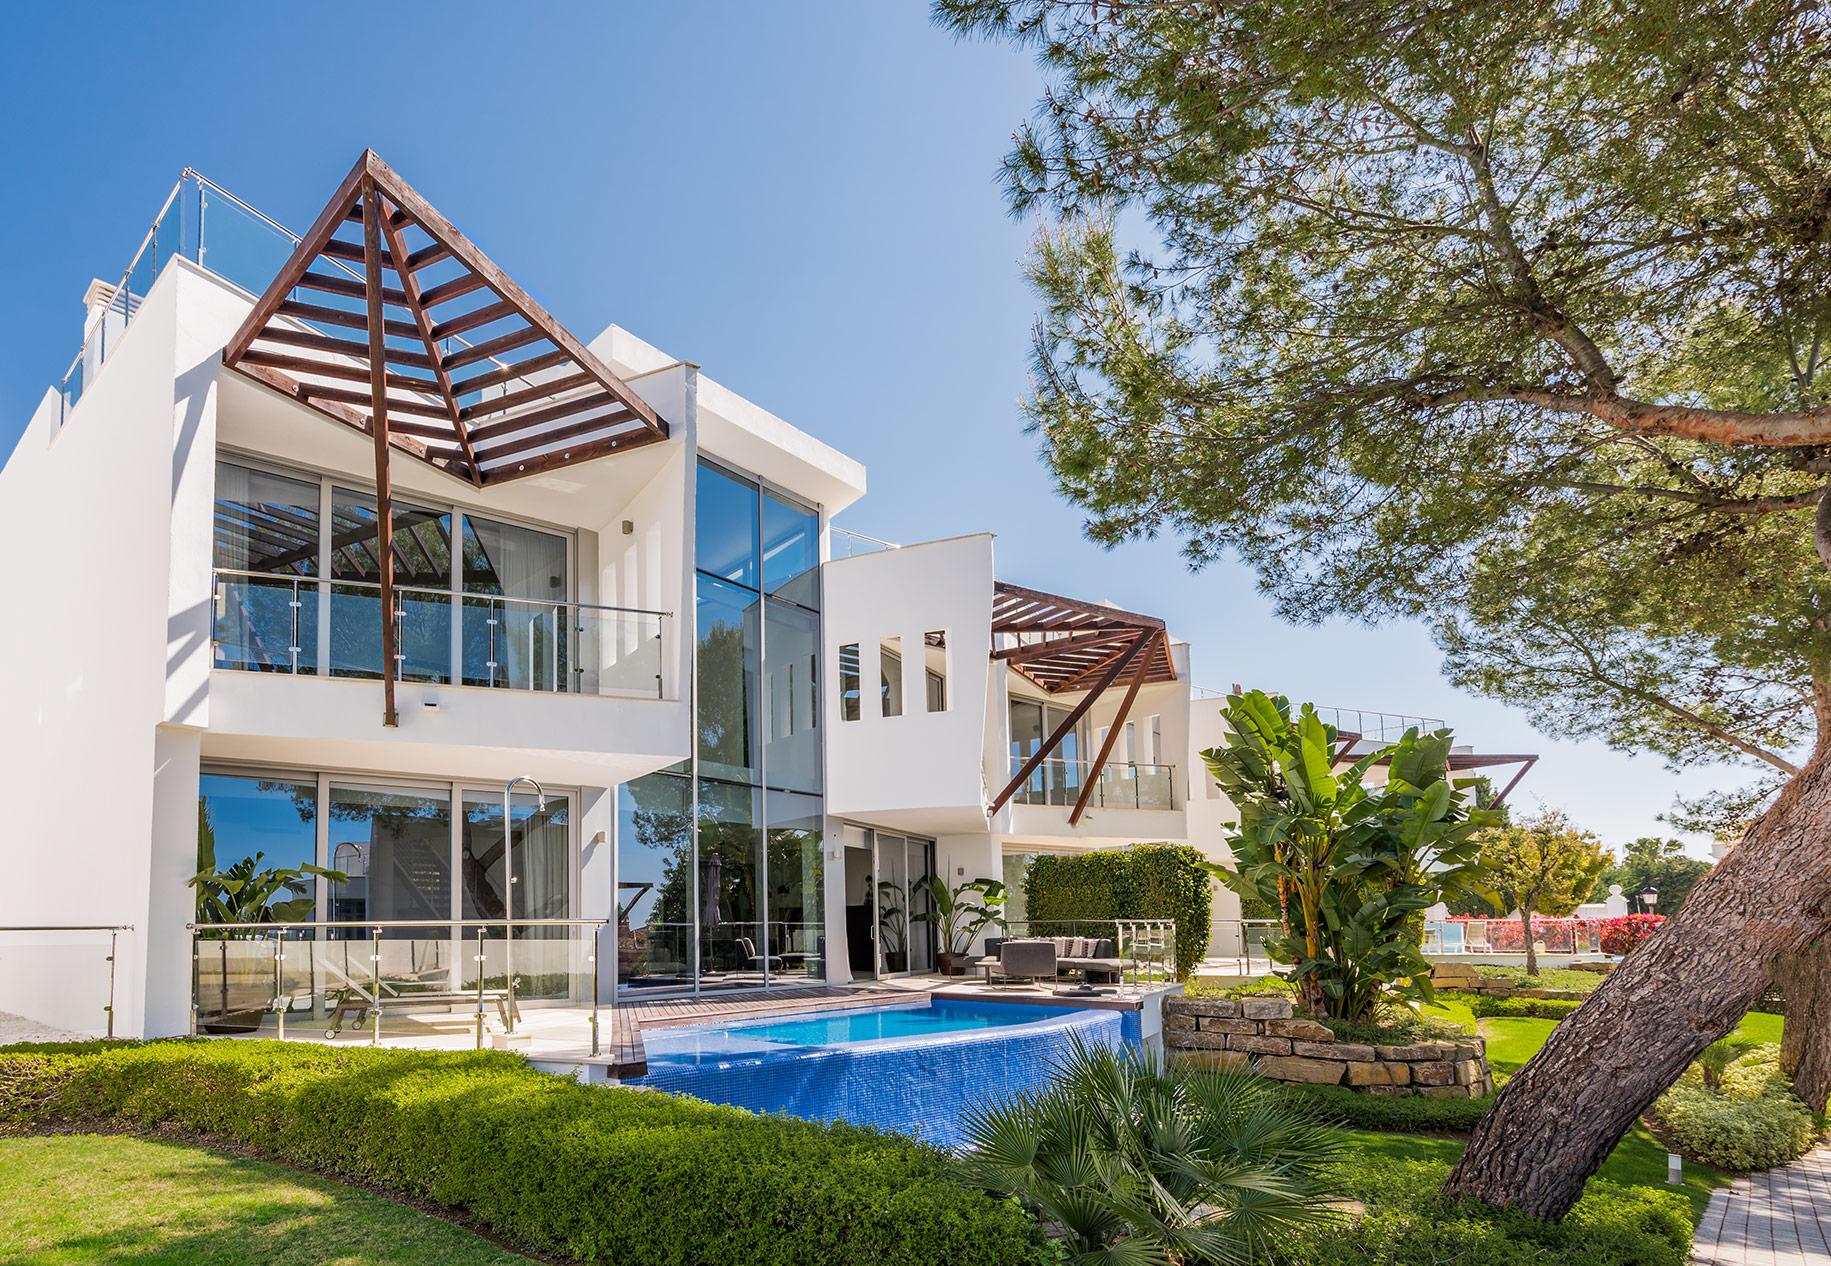 359-00176P: Semi detached house in Marbella